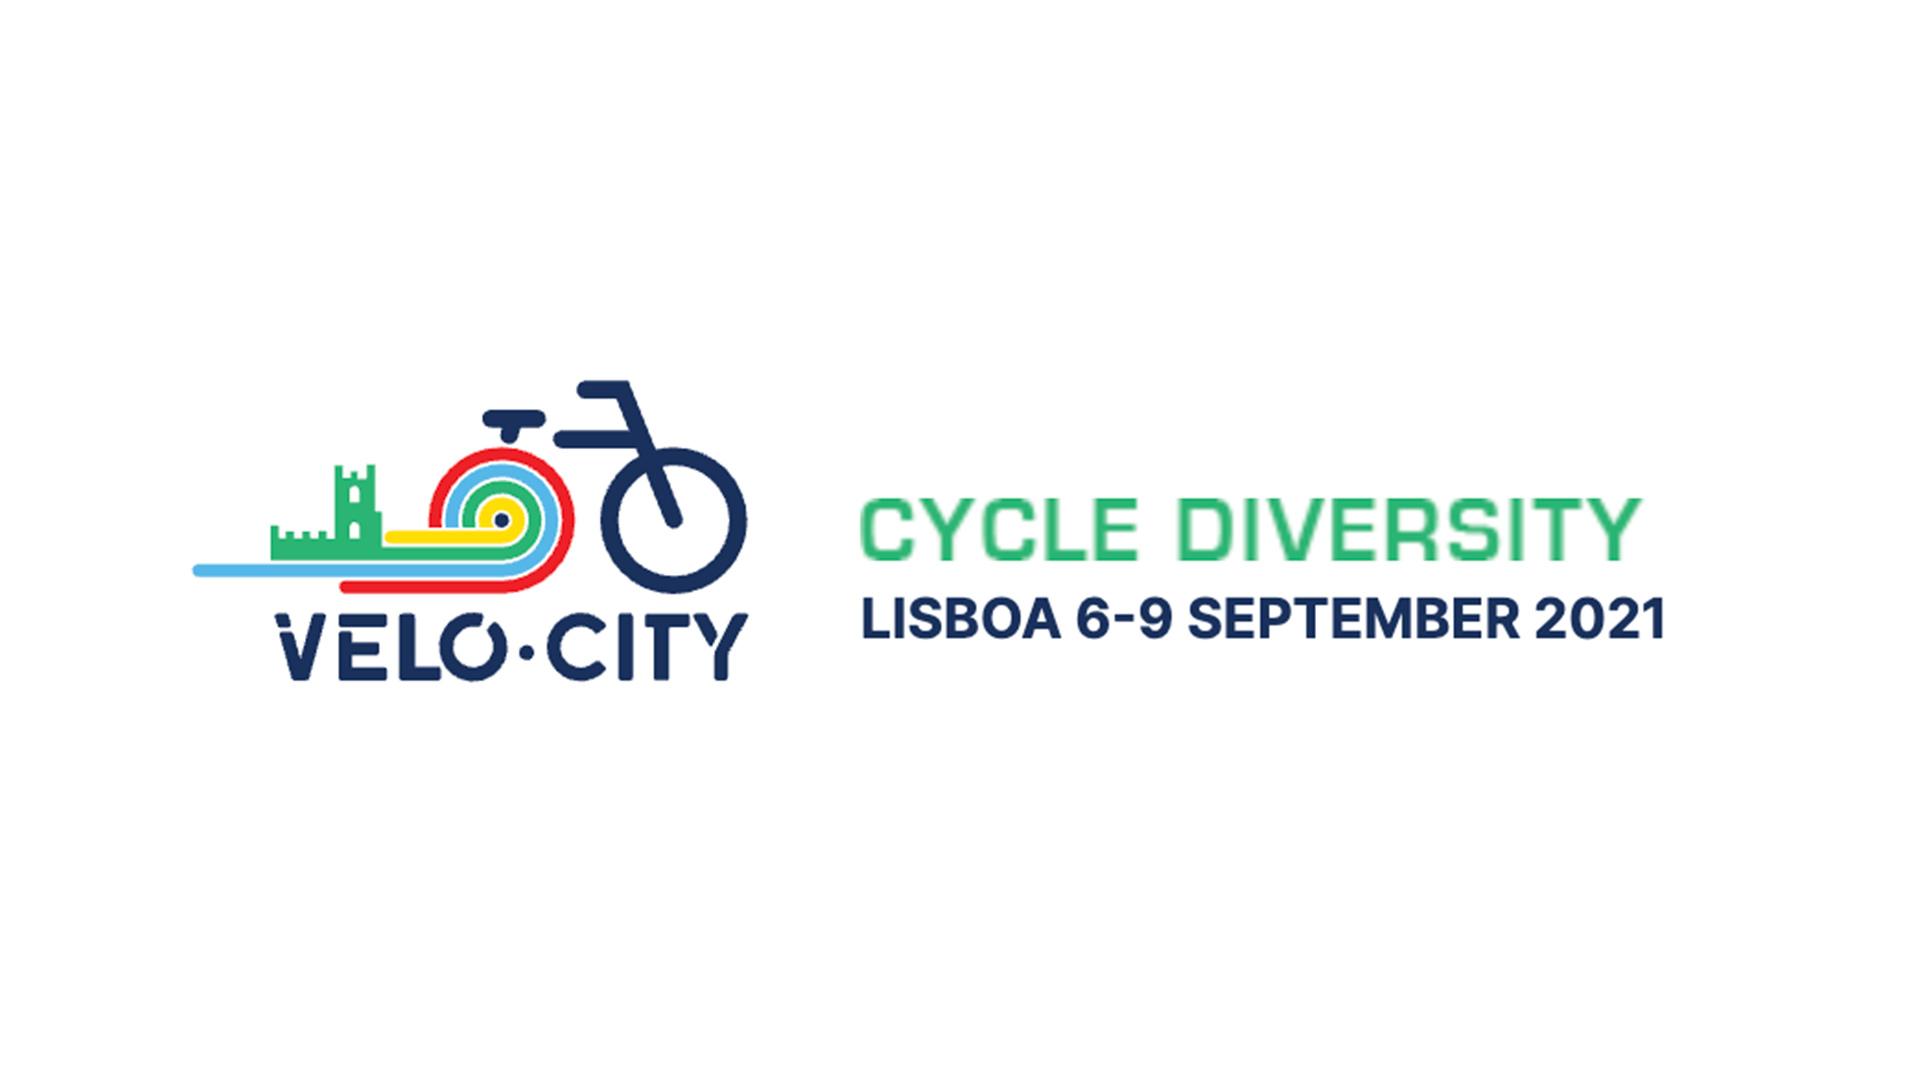 9 septembre 2021 – Velo-city 2021 – Lisbonne (Portugal)